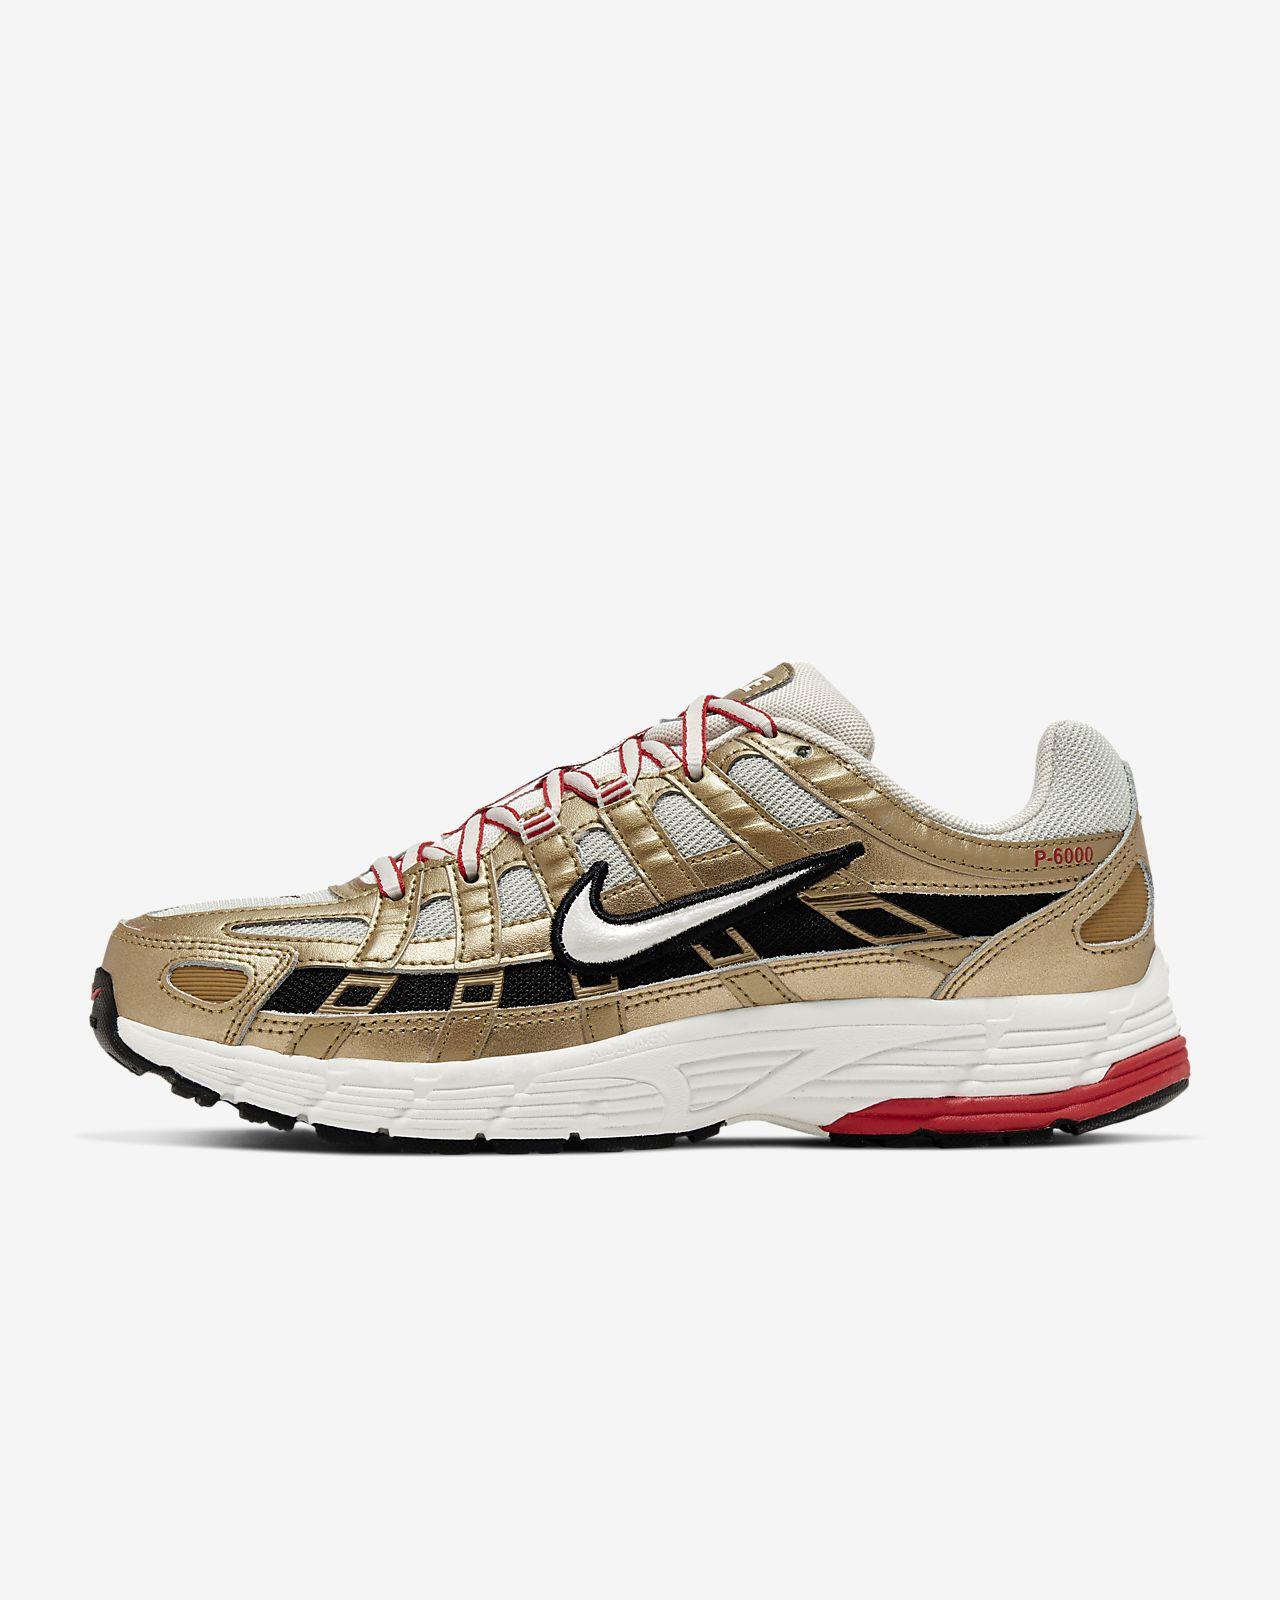 Nike P-6000 Icon Clash Shoe